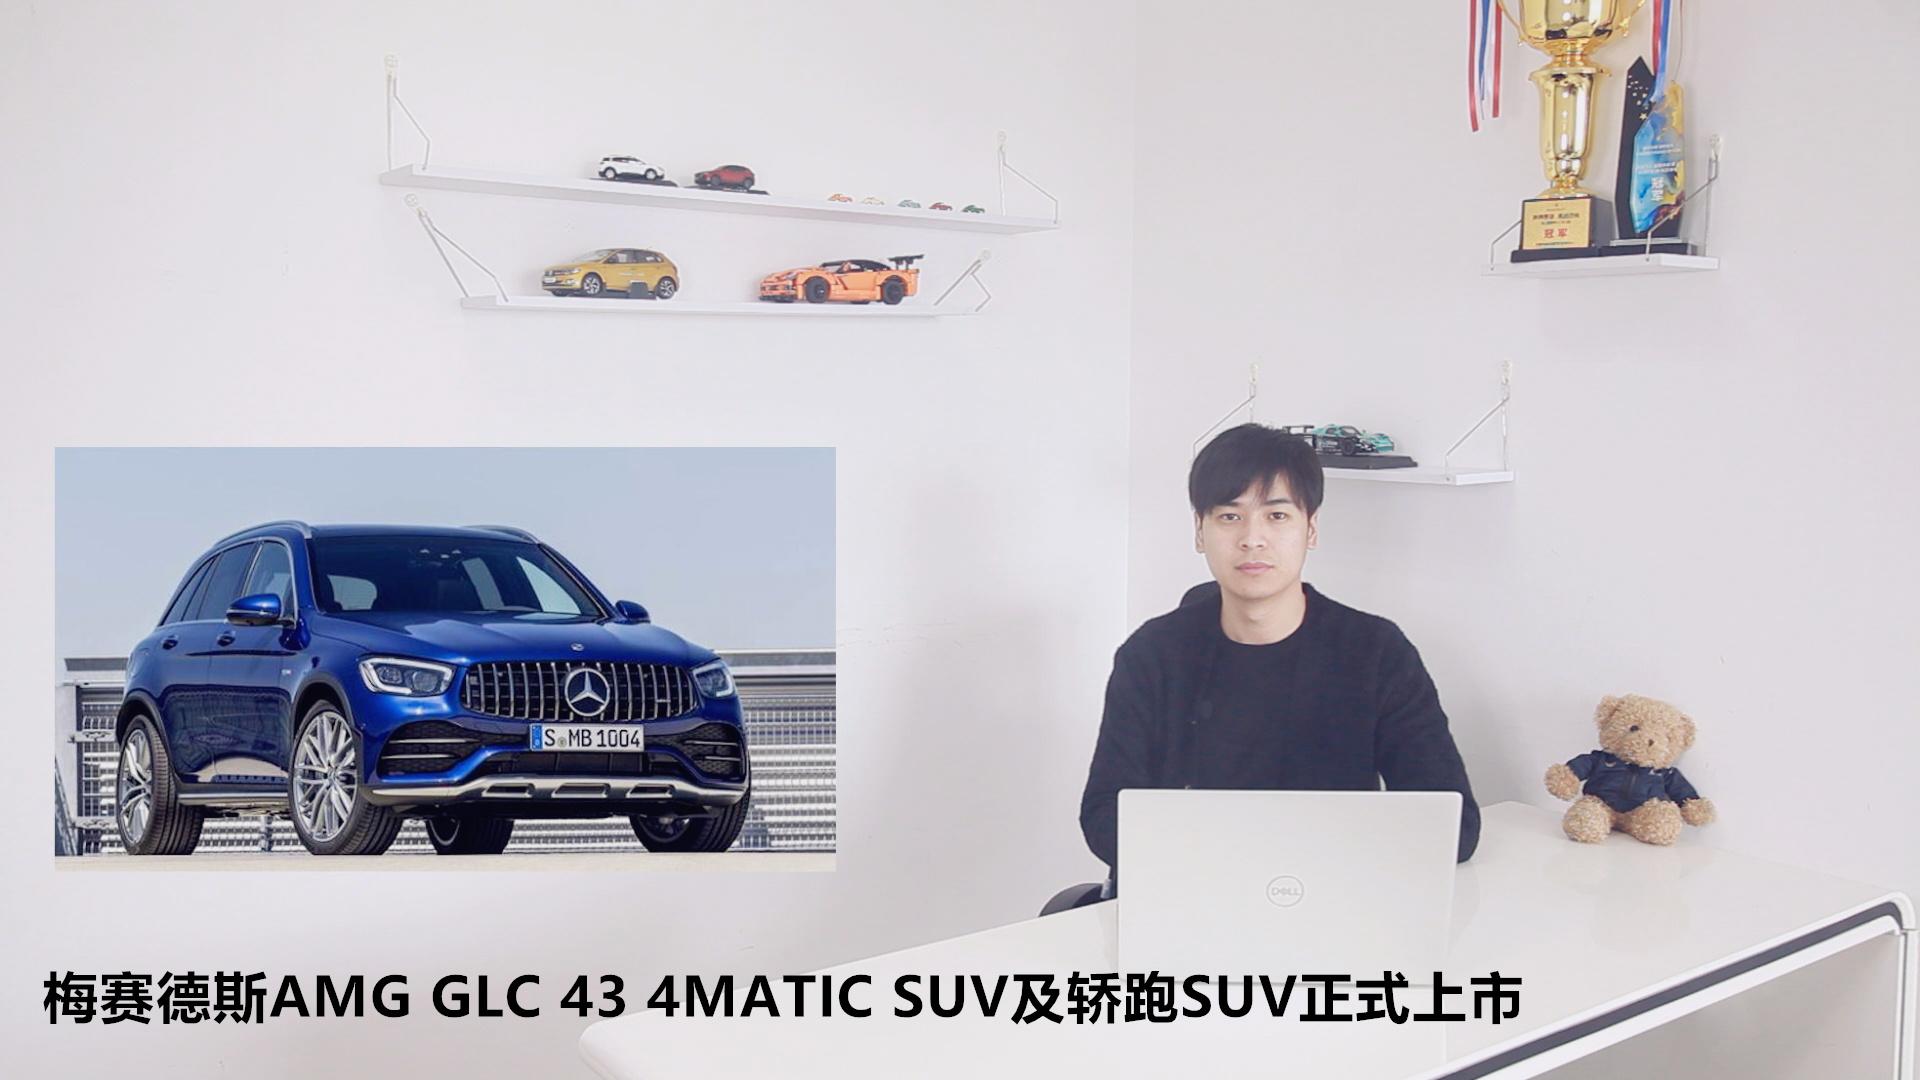 AMG GLC 43 SUV及轿跑SUV正式上市